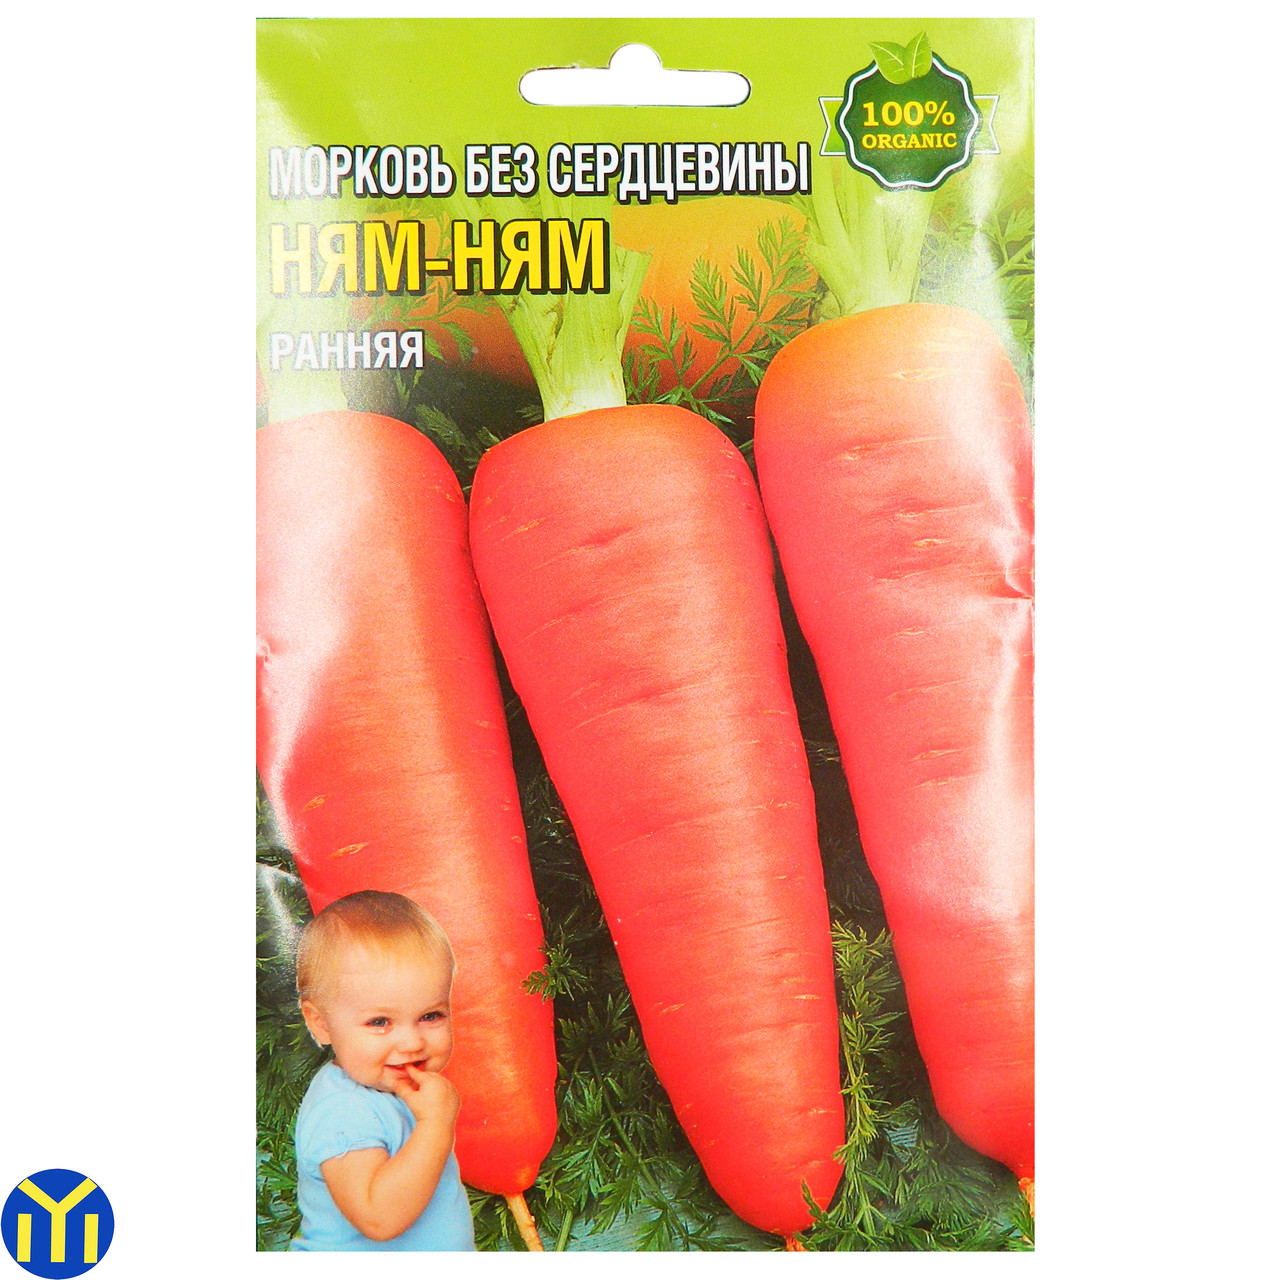 Семена морковь без сердцевины Ням-Ням, Ранняя